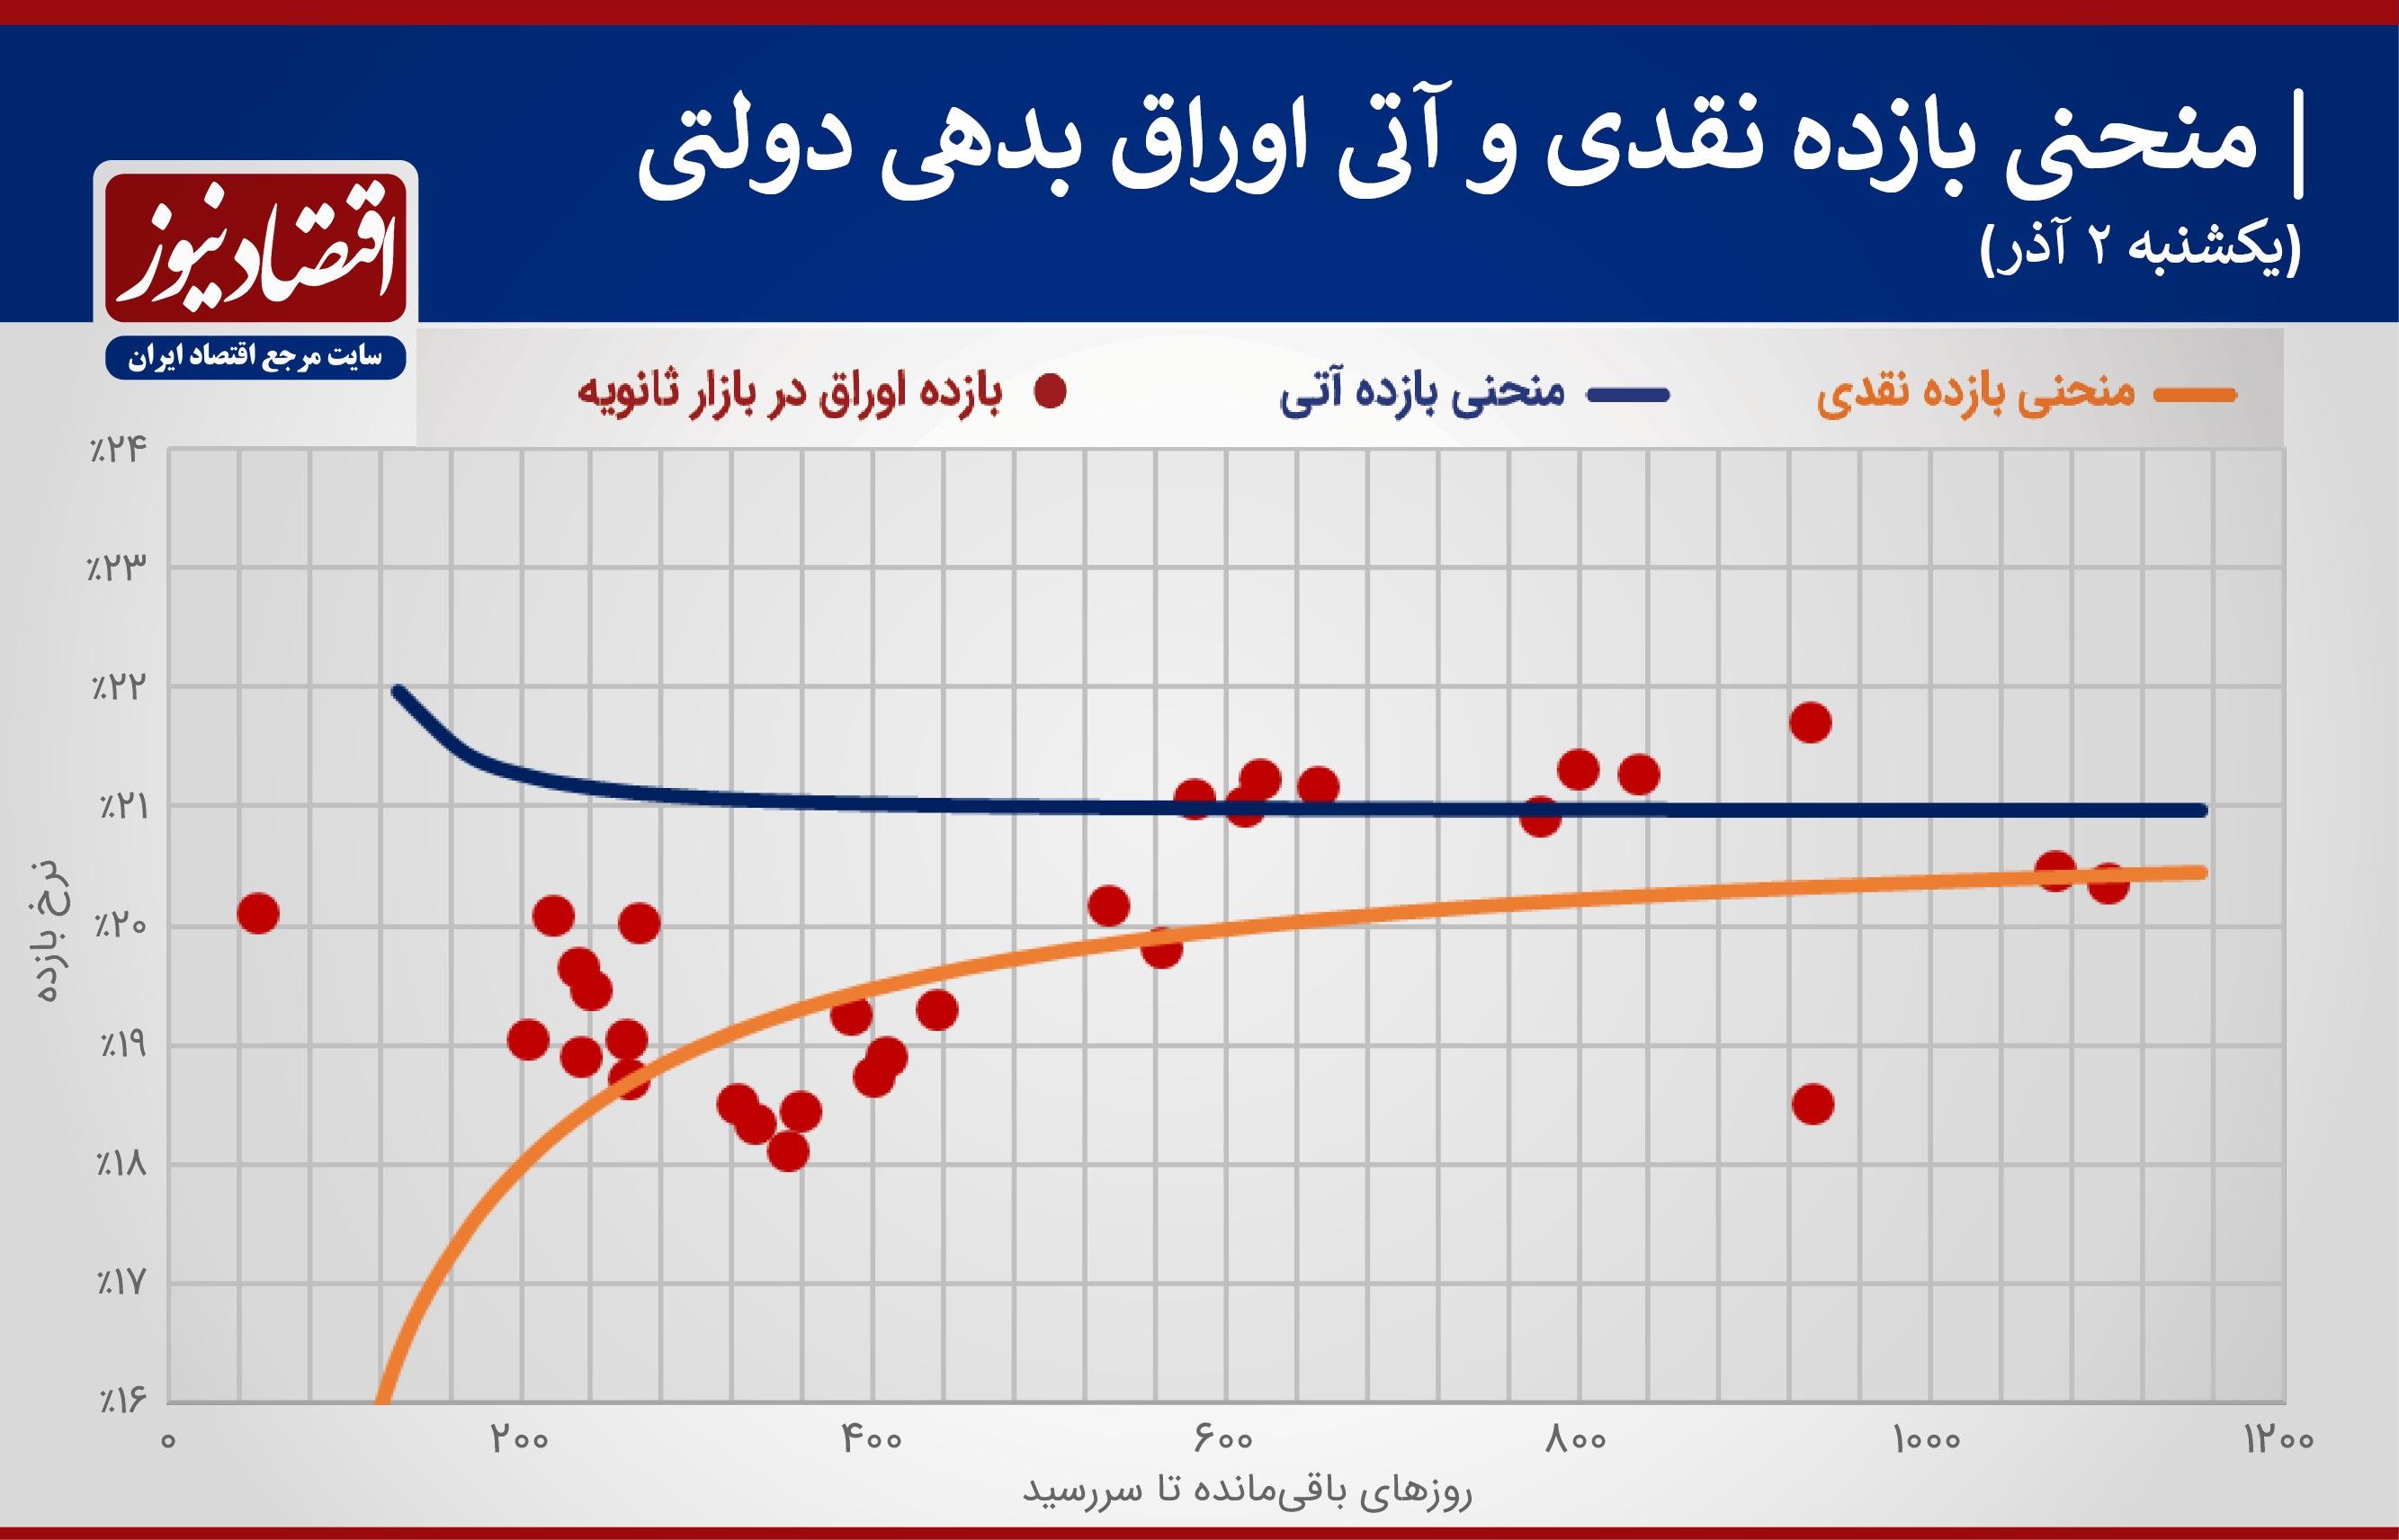 منحنی اوراق بدهی 2 آذر